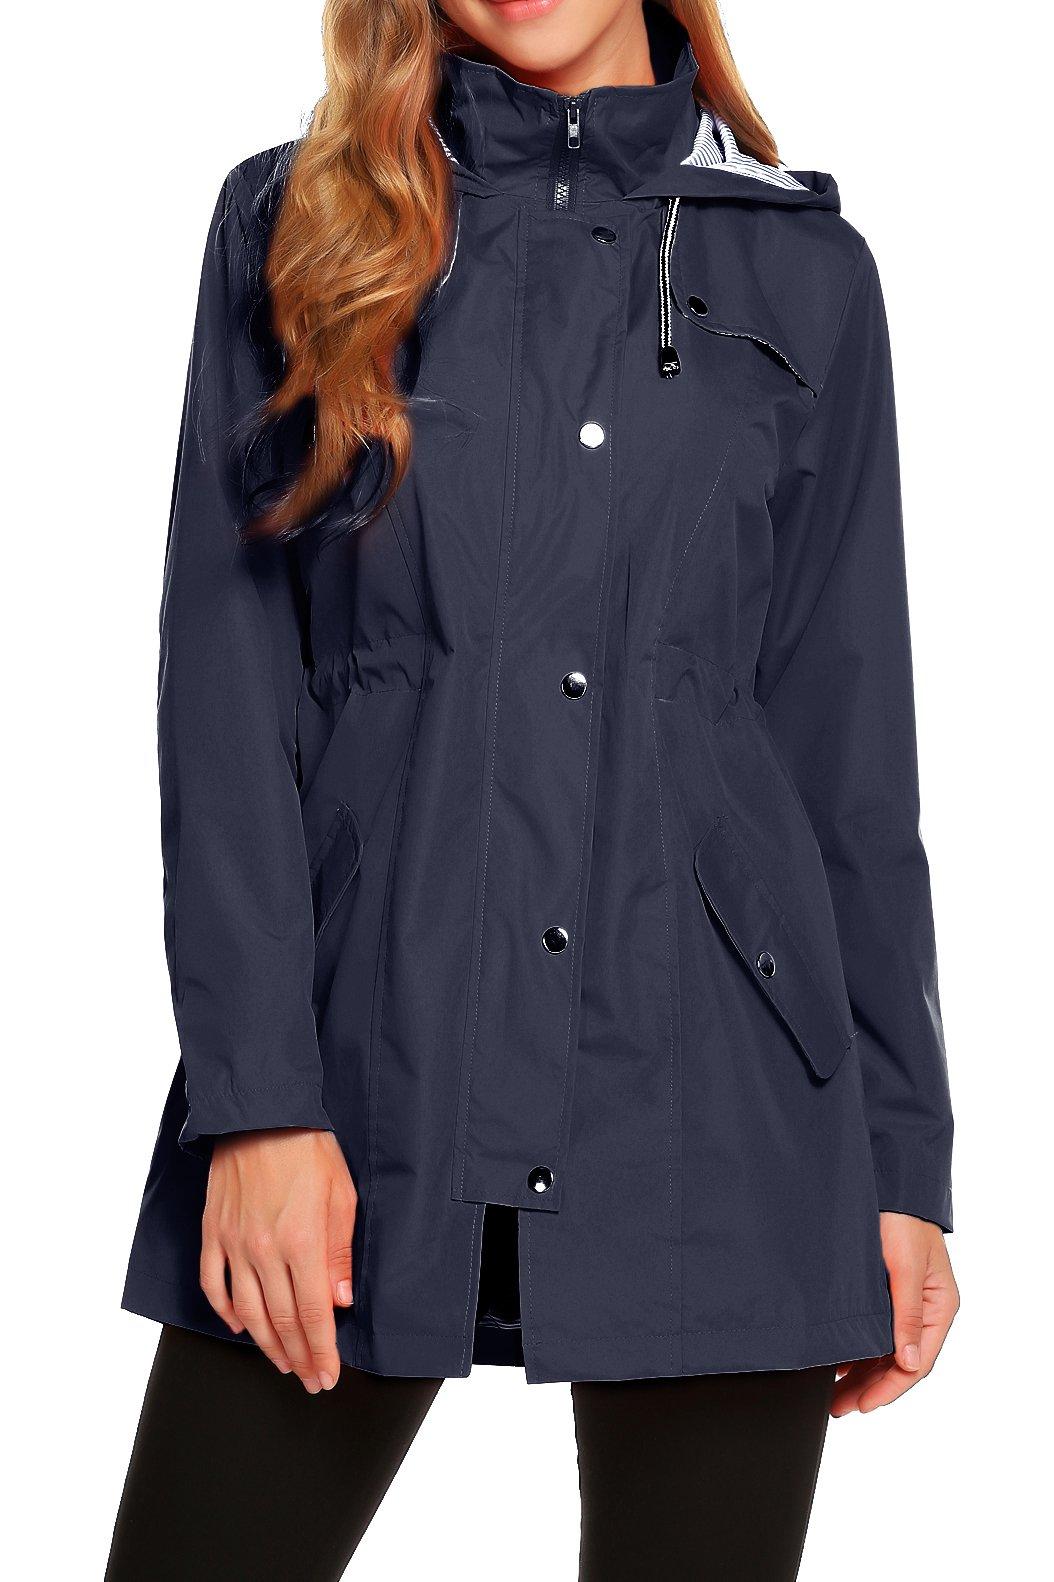 ZHENWEI Womens Lightweight Hooded Waterproof Active Outdoor Rain Jacket S-XXL (L, Navy Blue) by ZHENWEI